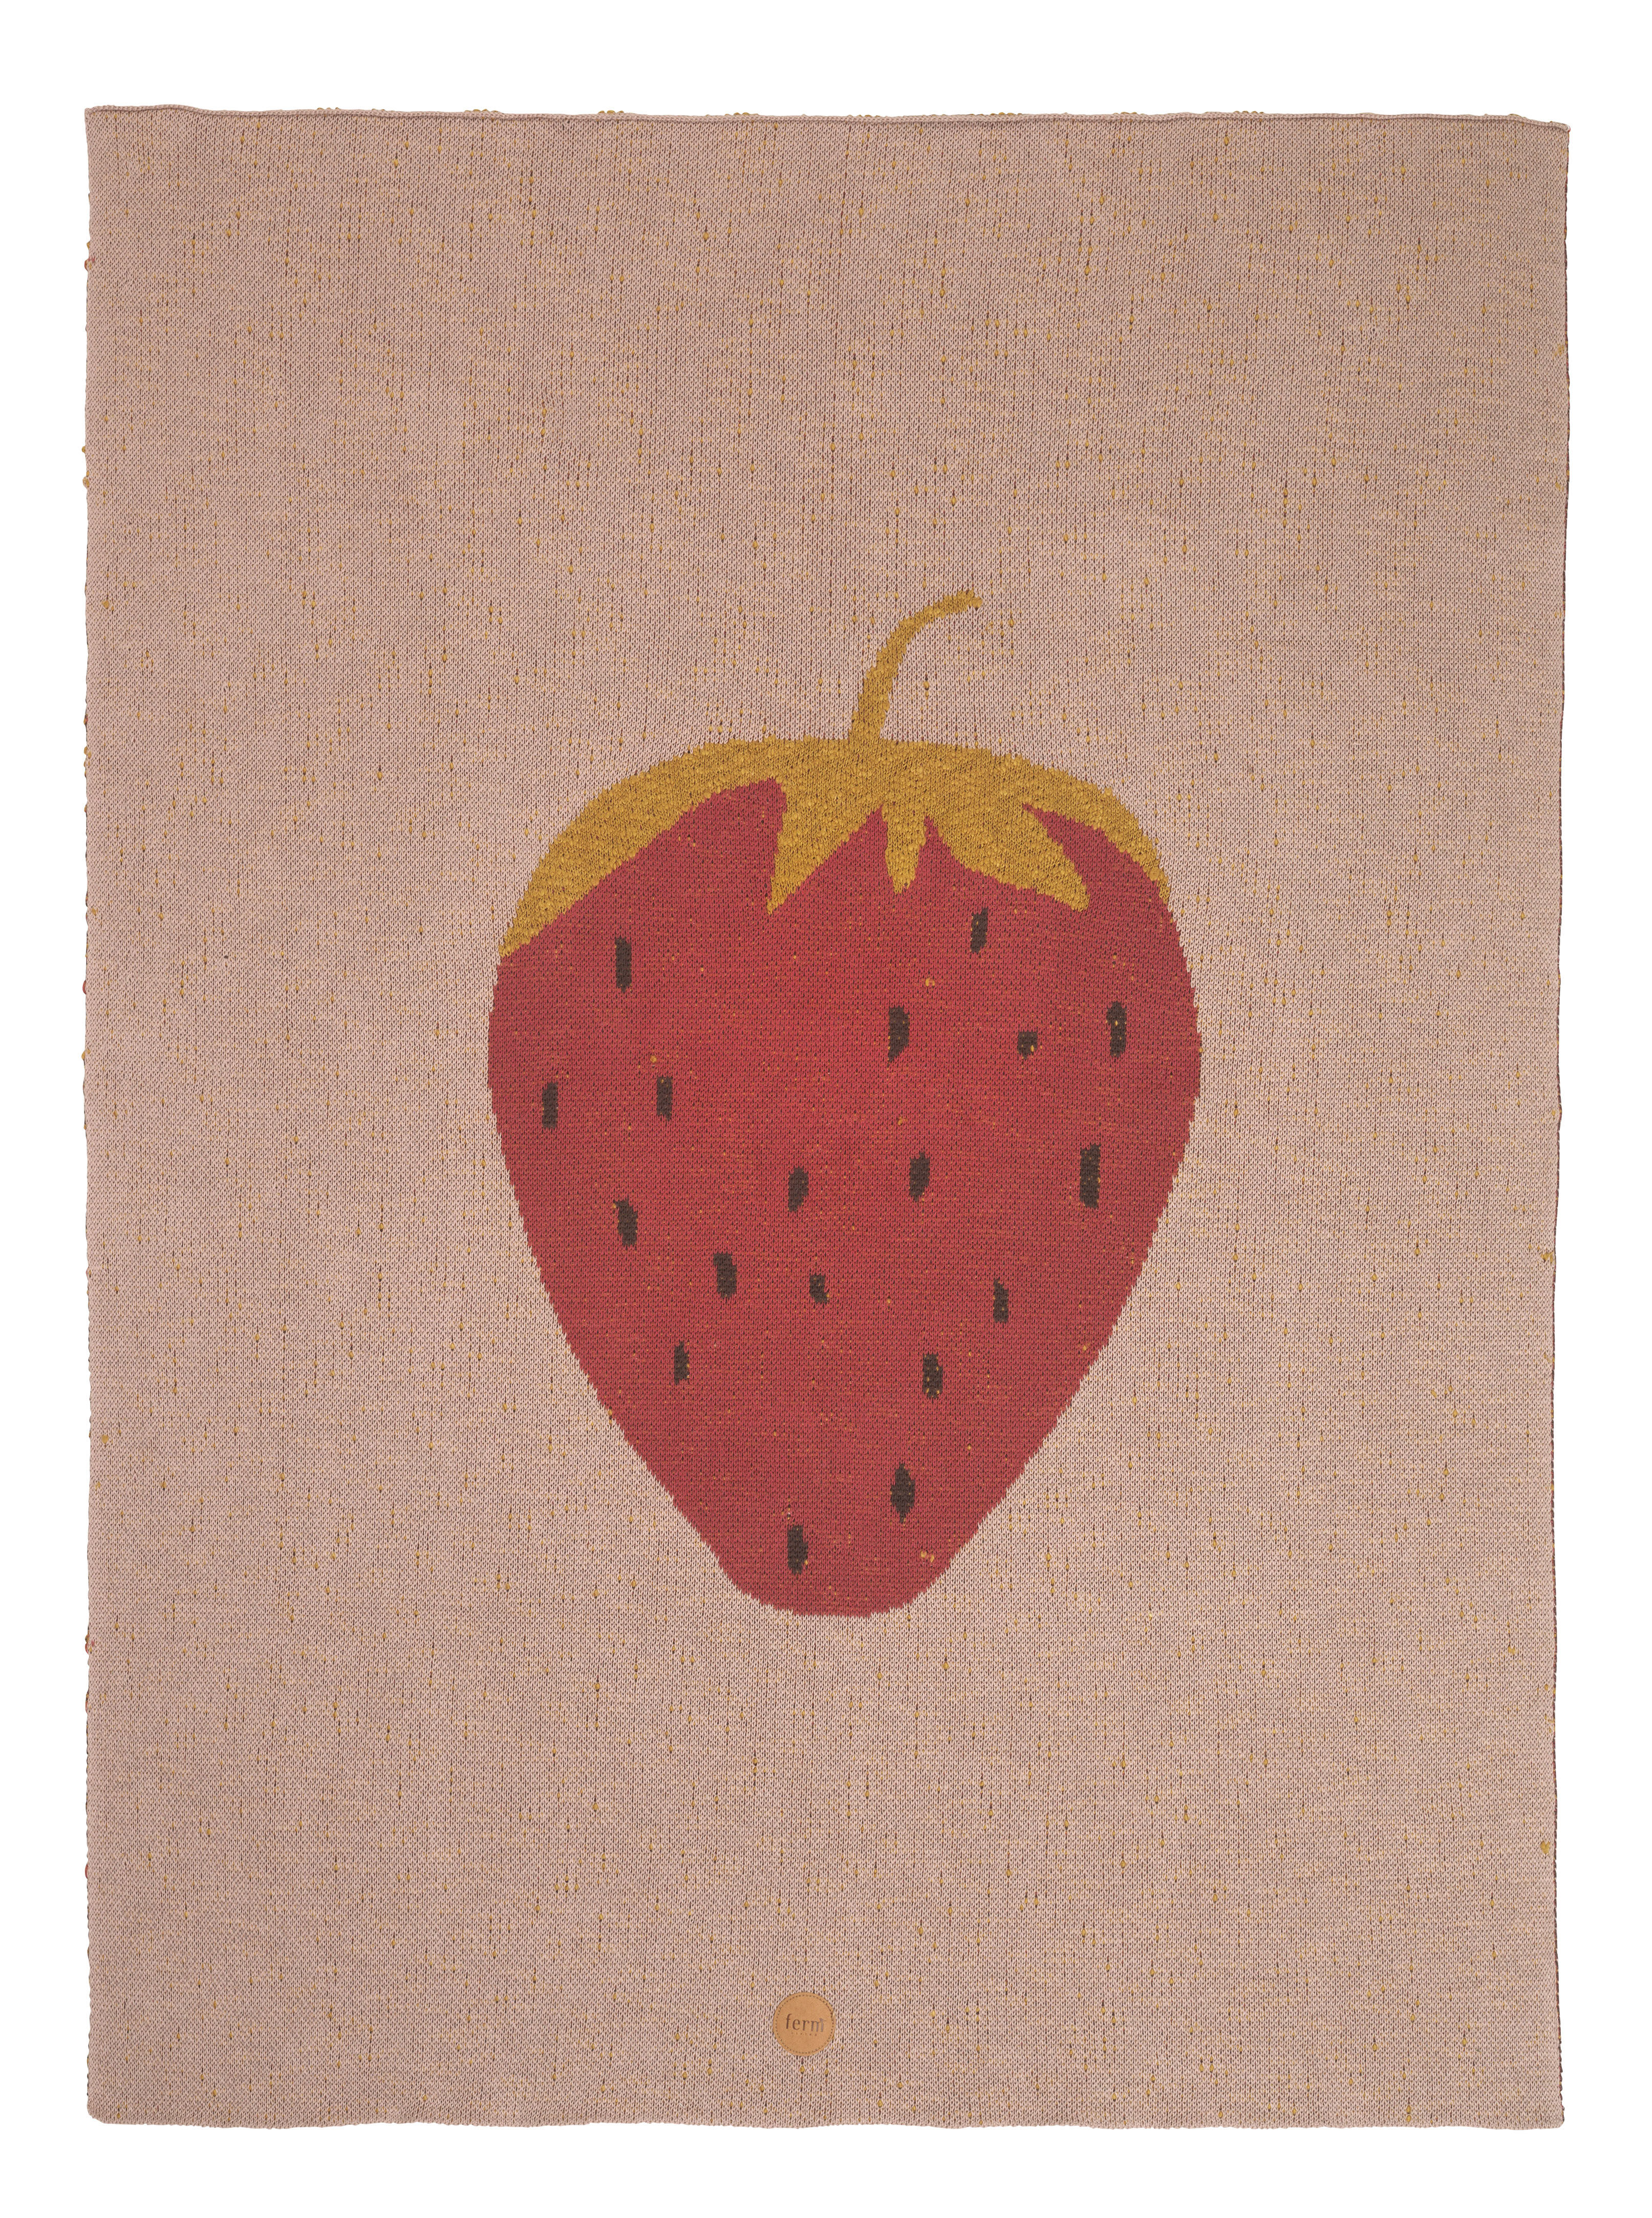 Decoration - Children's Home Accessories - Fraise Children blanket - / 80 x 100 cm - Cotton by Ferm Living - Strawberry / Pink - Cotton